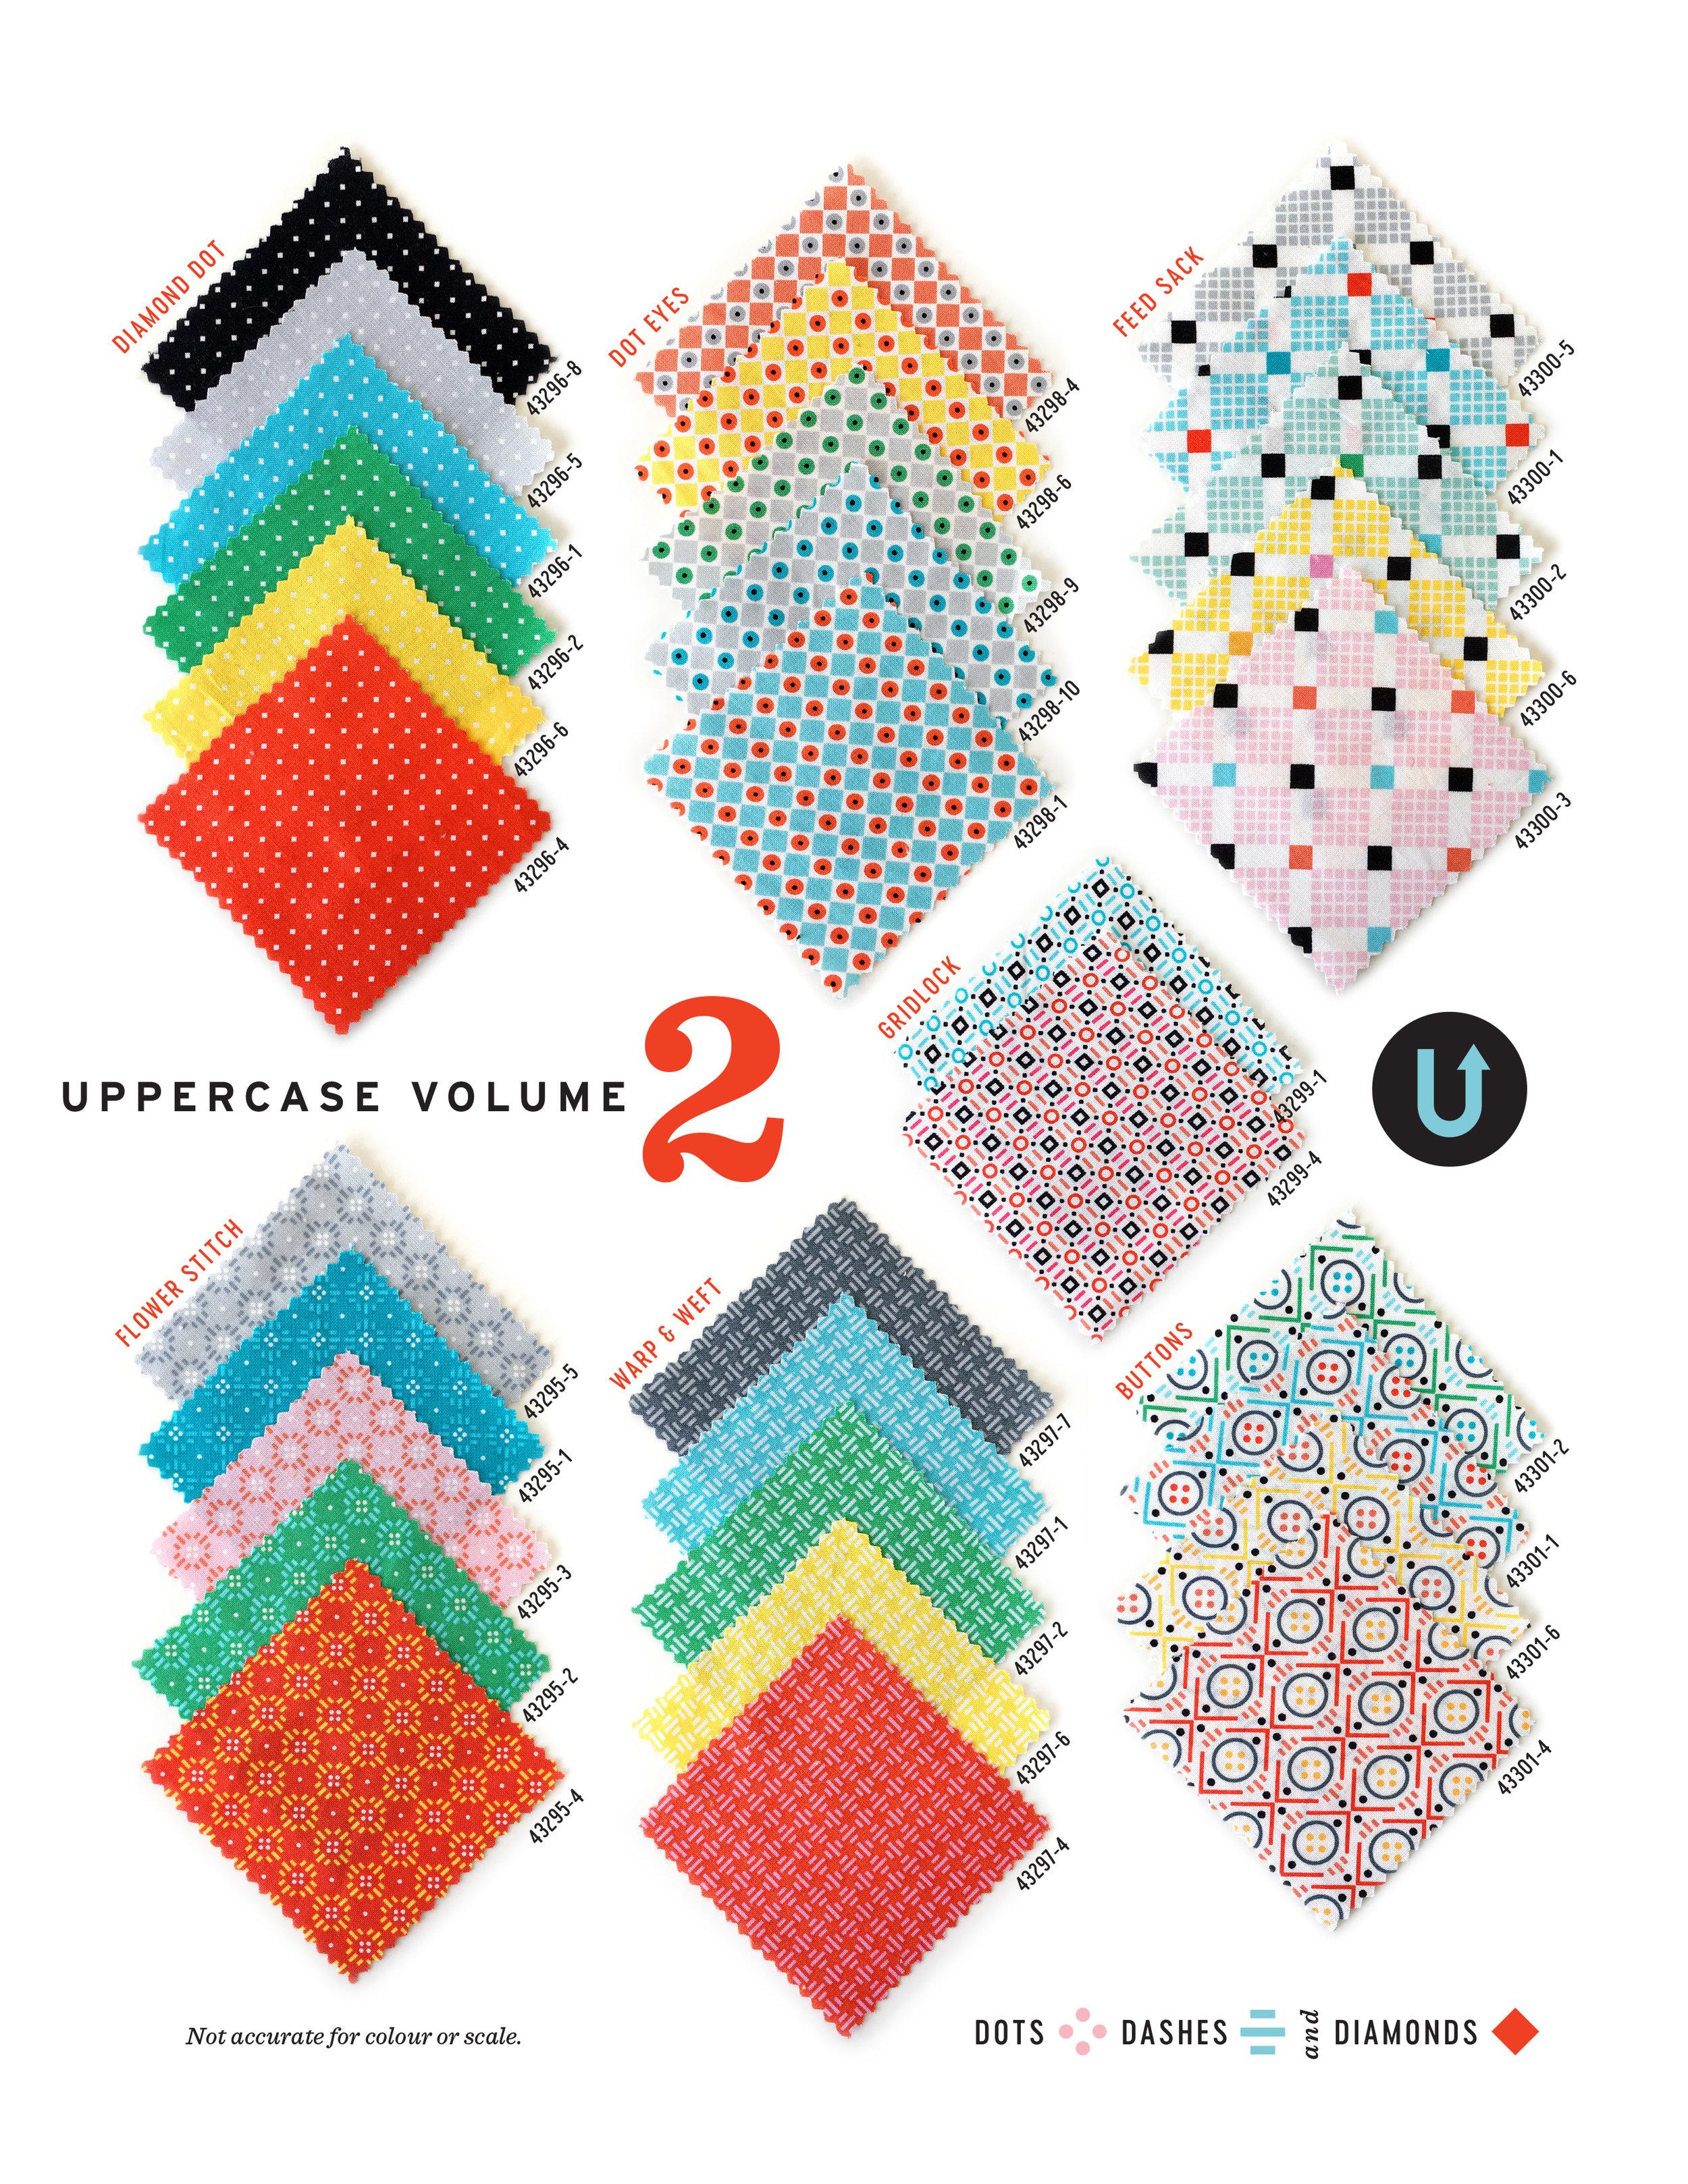 UPPERCASE-WindhamFabrics-Volume2-DotsDashesDiamonds.jpg